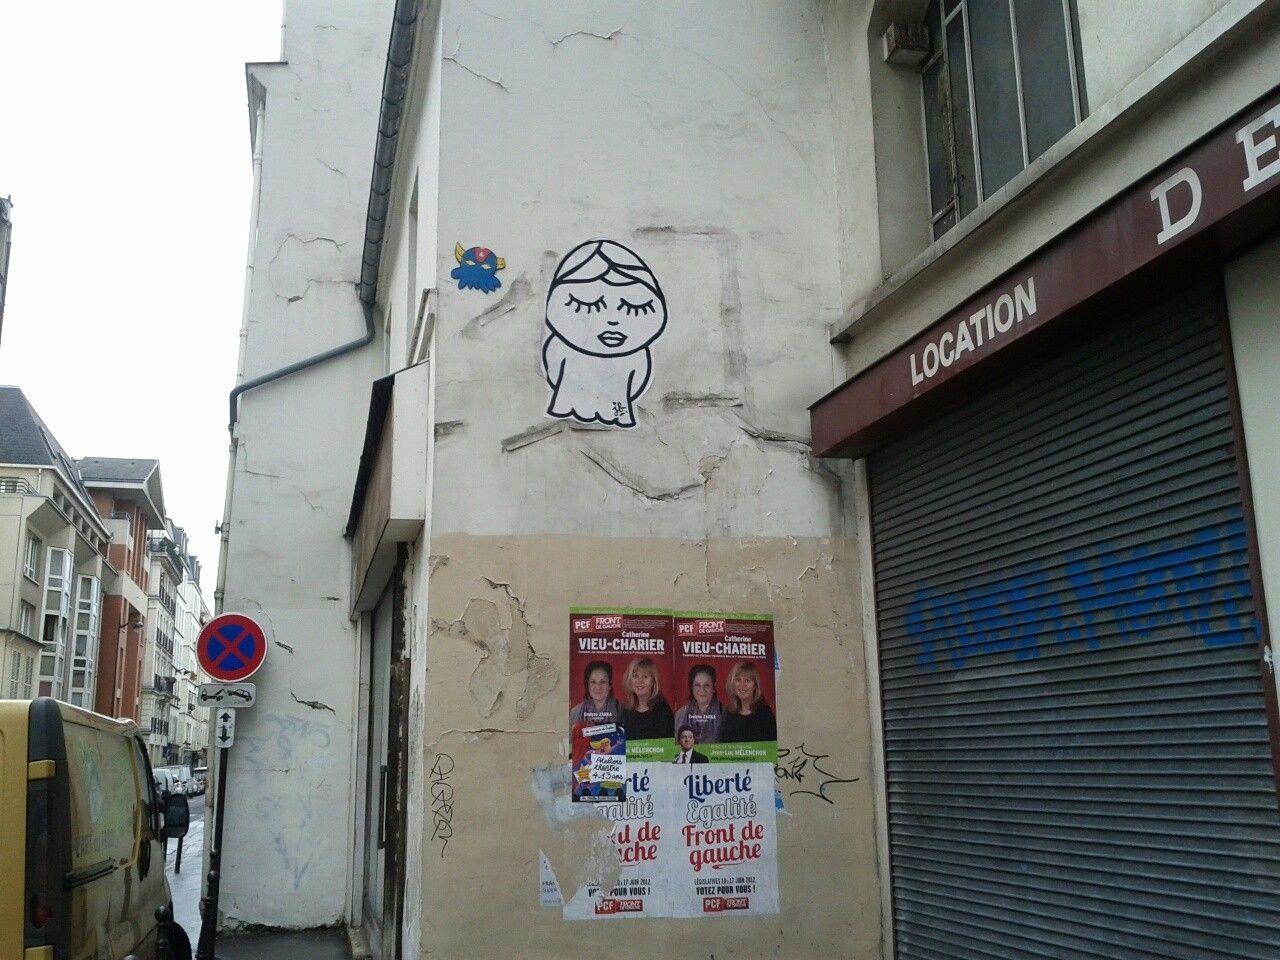 Gzup, Jb, Streetart, Urbacolors